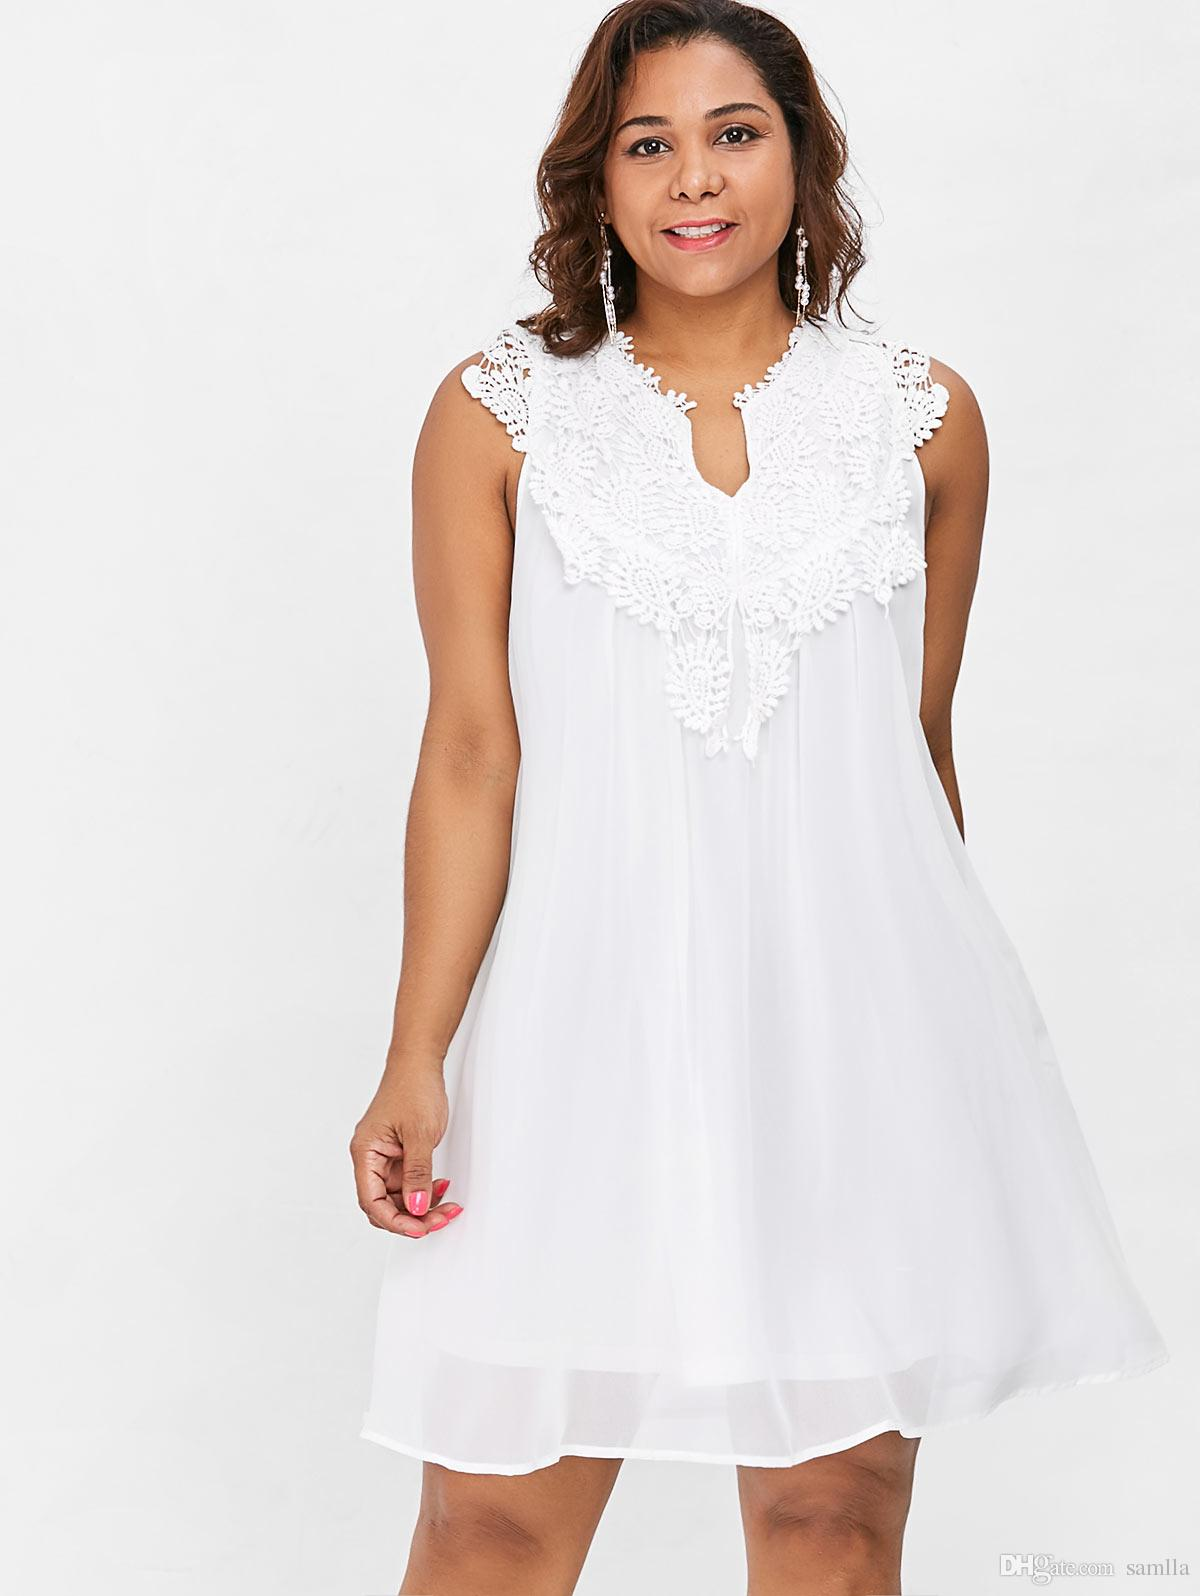 2019 Crochet Panel Babydoll Dress Plus Size Women V Neck Hollow Out Lace  Spliced Mini A Line Chiffon Dress Vestidos 5XL From Samlla, $31.76   ...